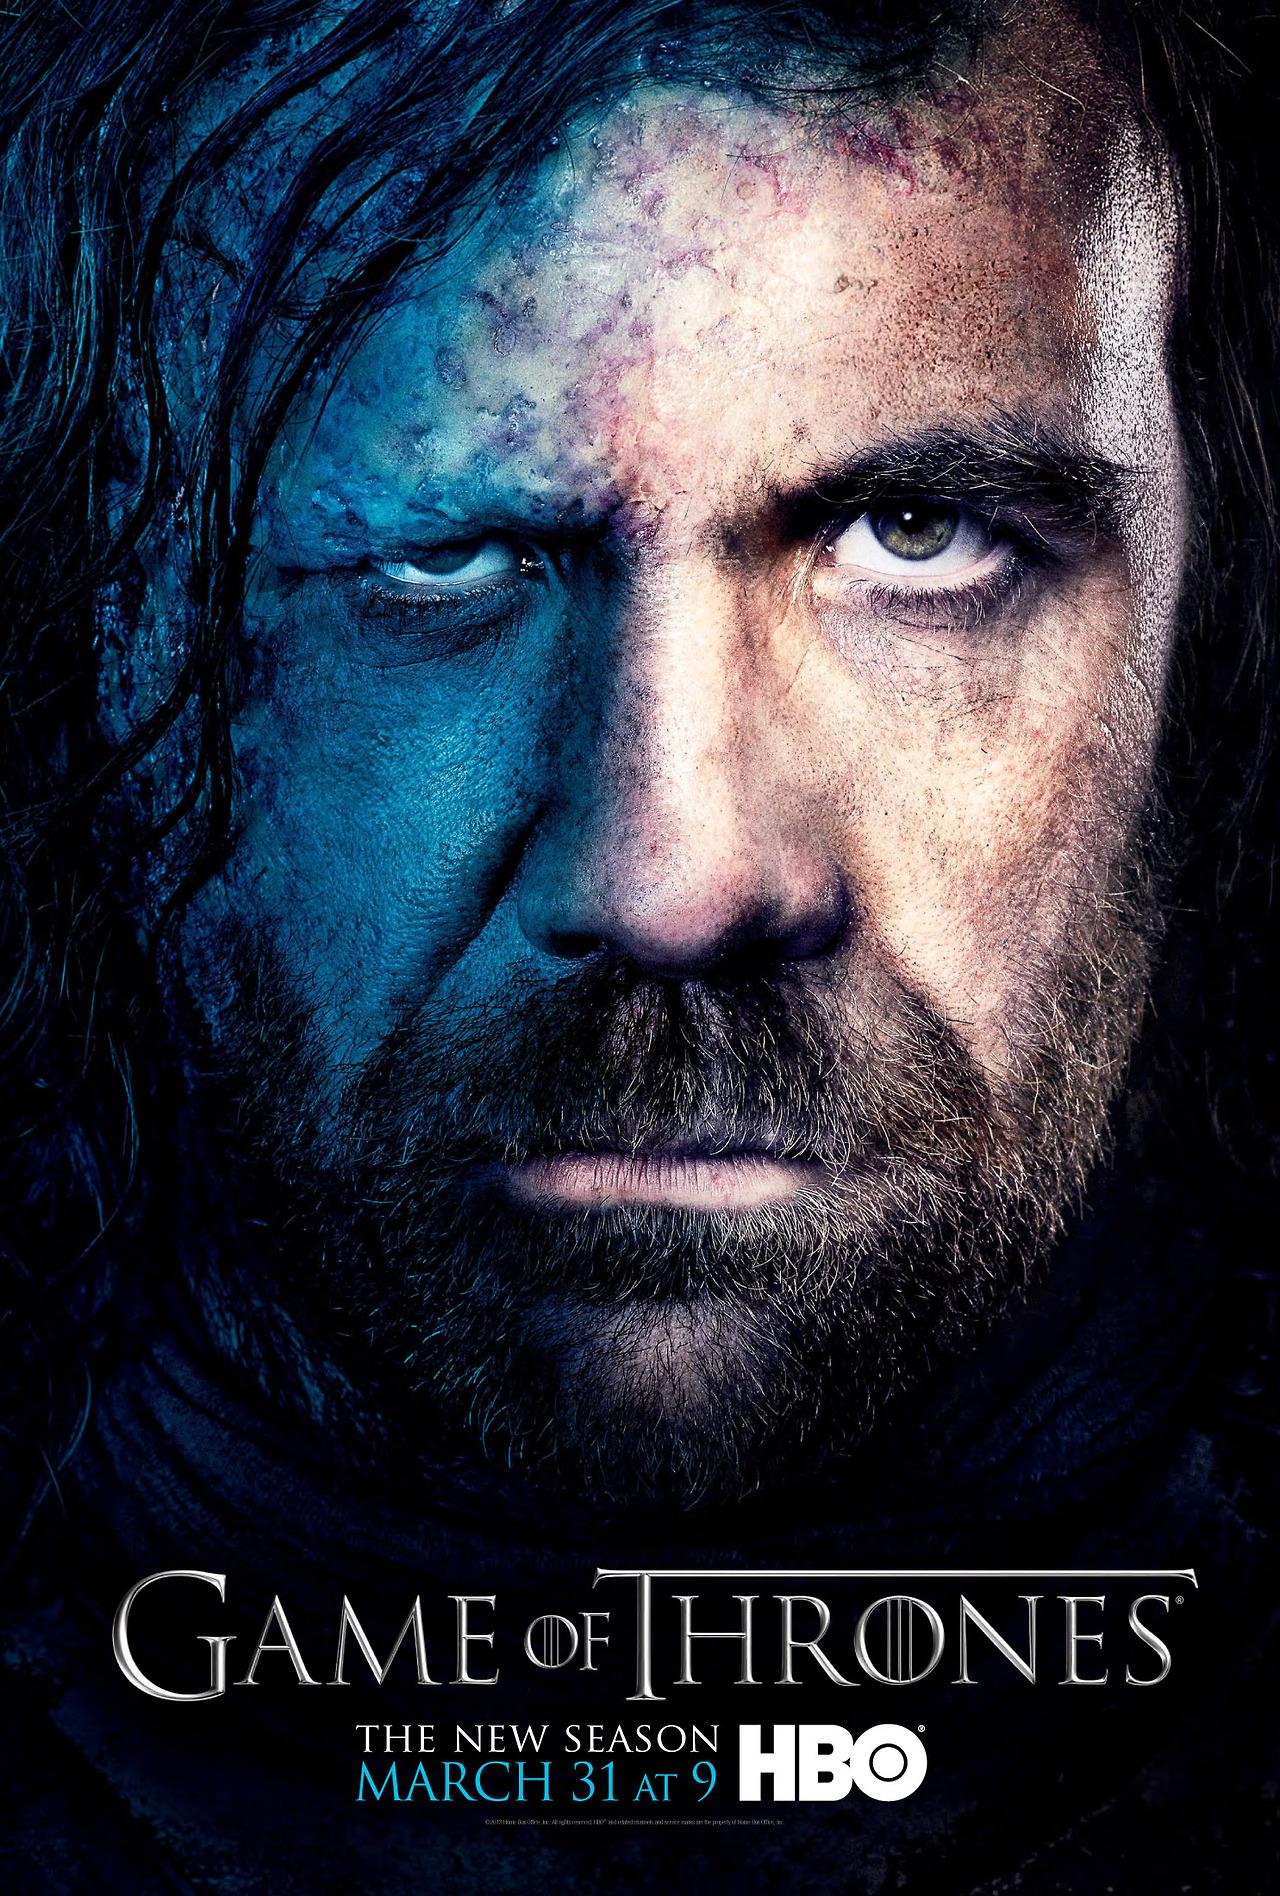 Season 3 - Character Poster - Sandor Clegane